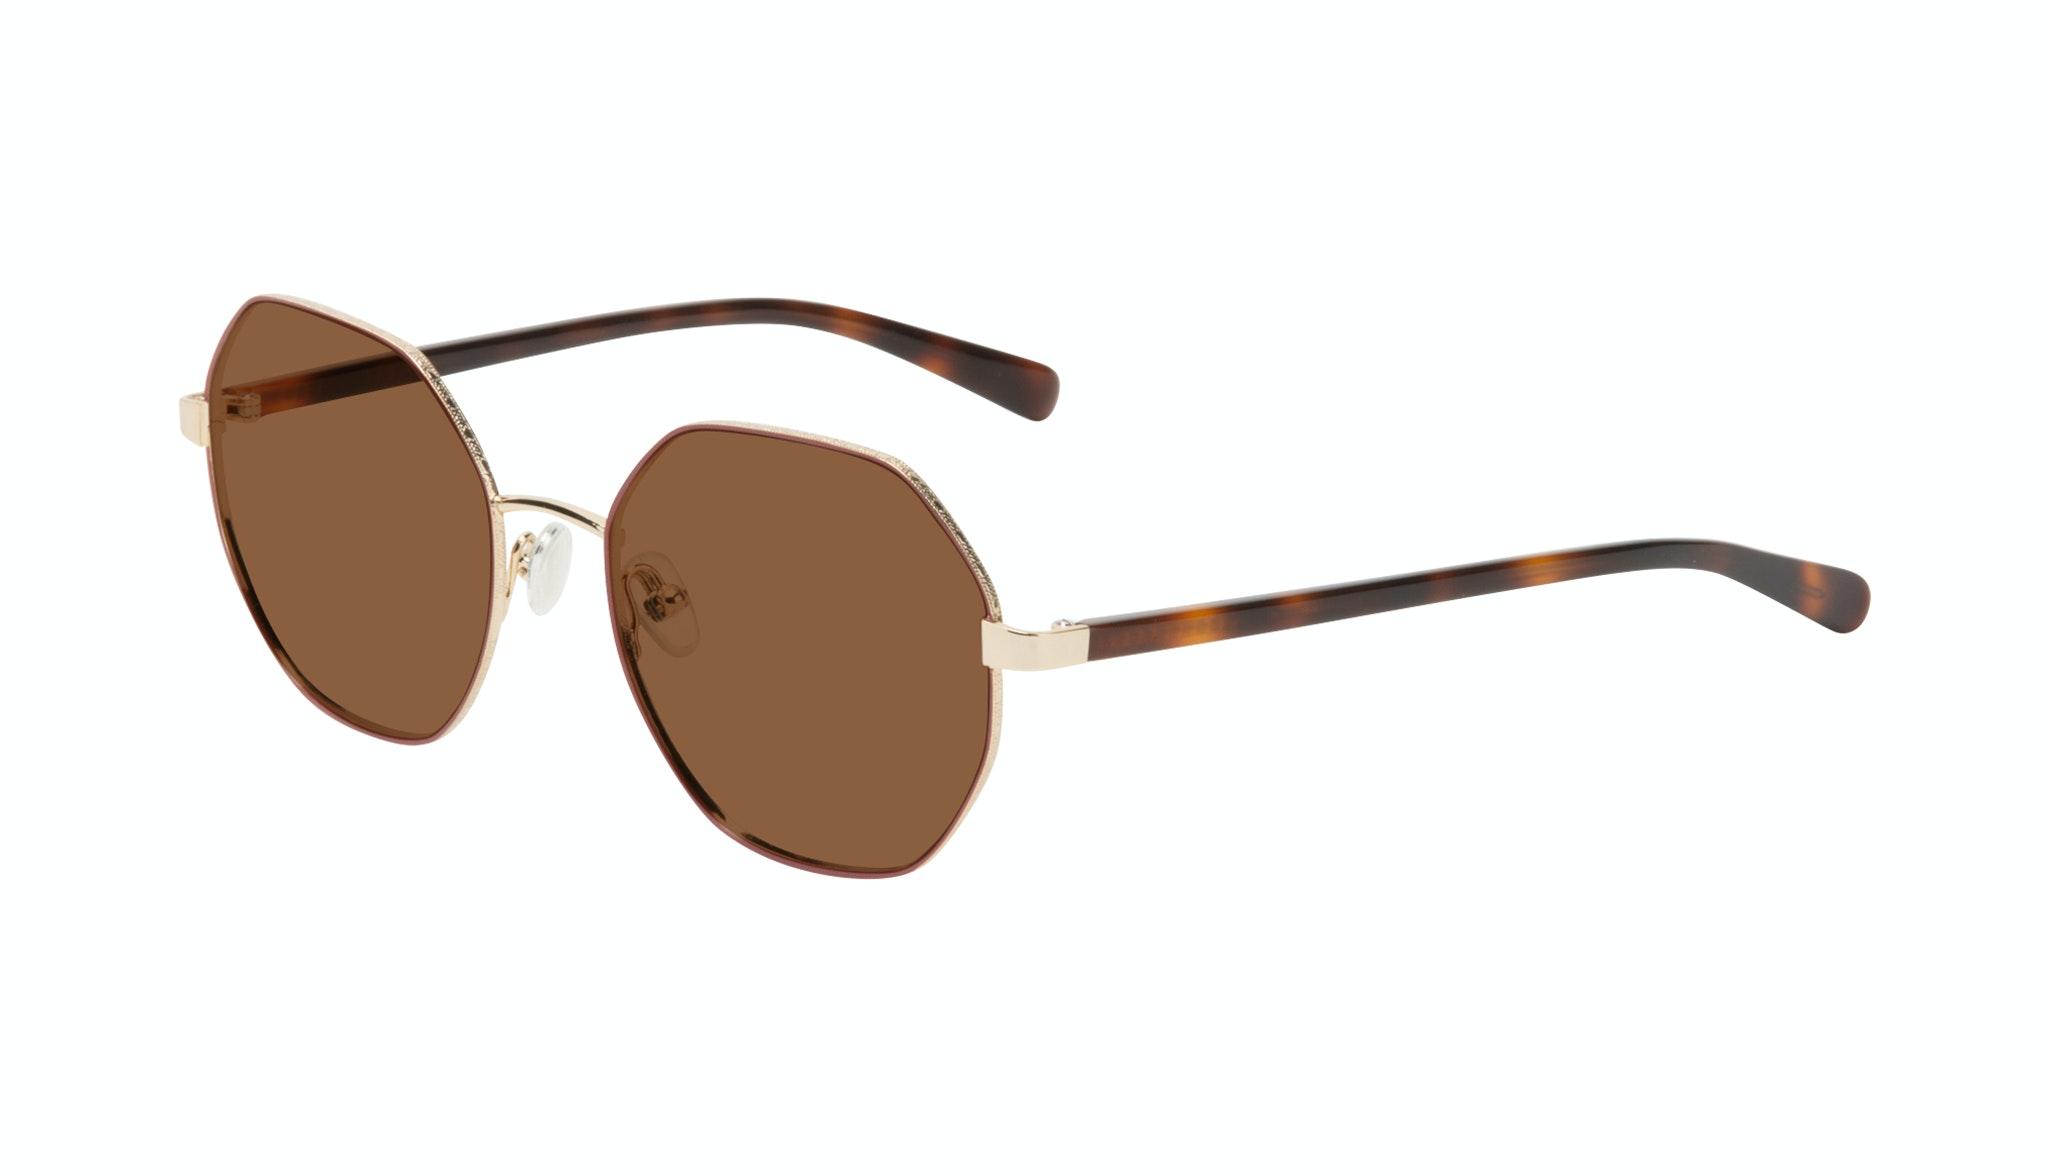 Affordable Fashion Glasses Round Sunglasses Women Fantasy Wine Tilt